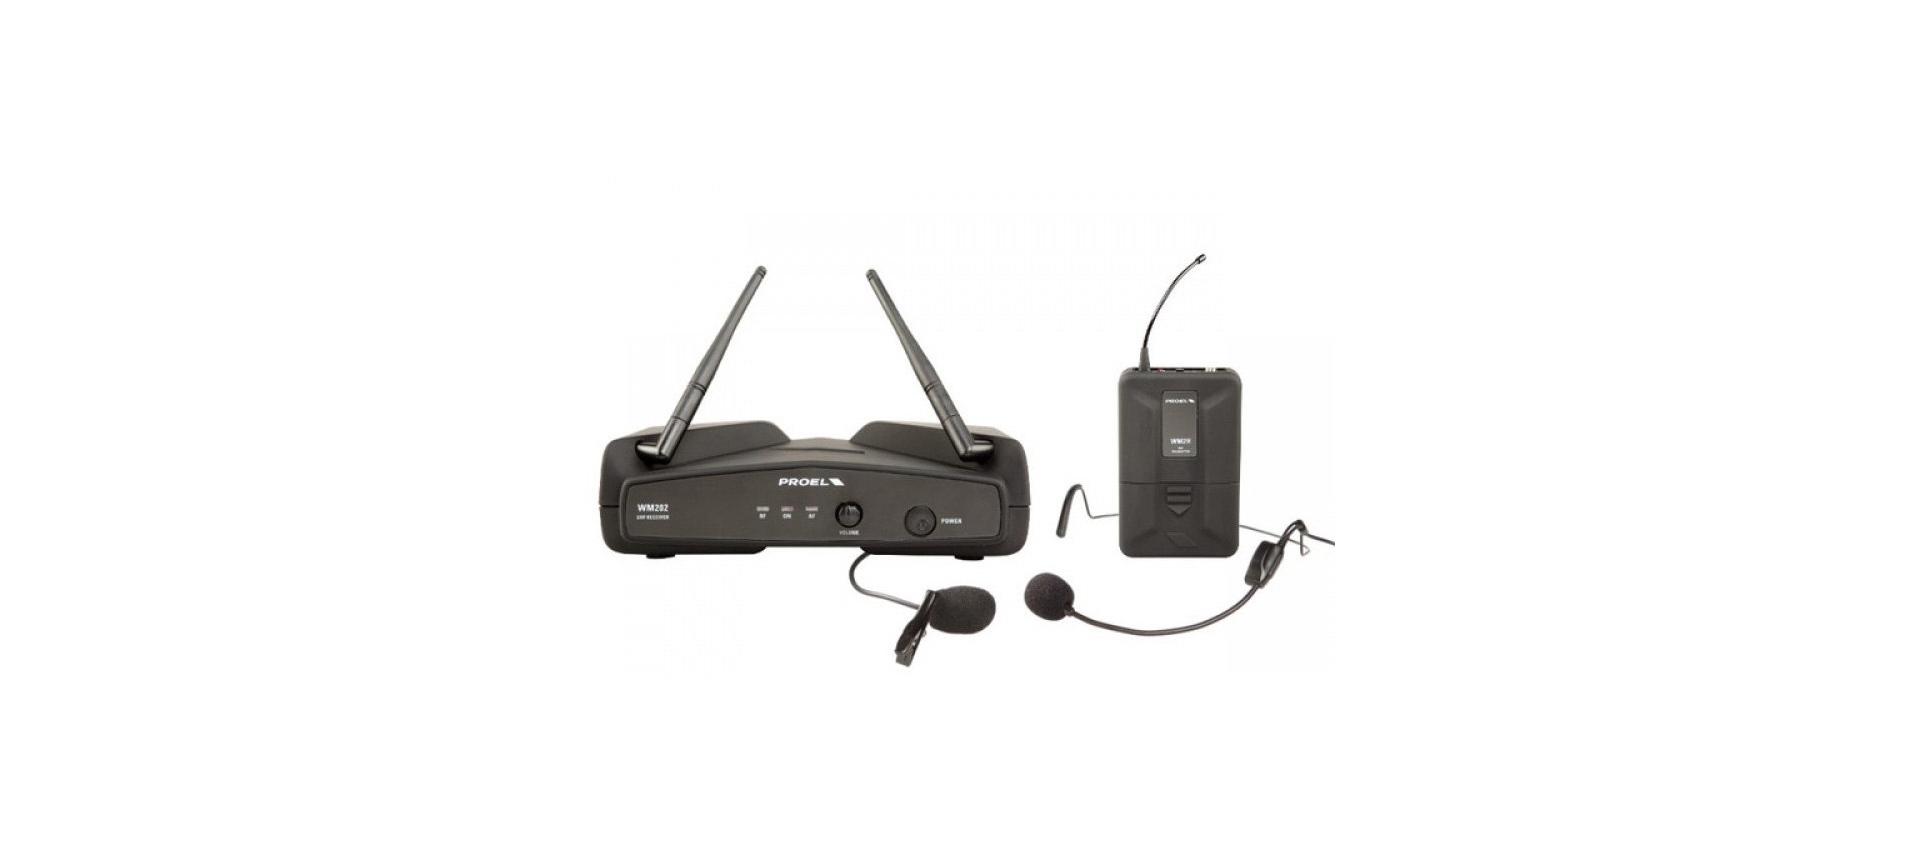 Proel Wm202h Radiomicrofono Headset Uhf 1 C E